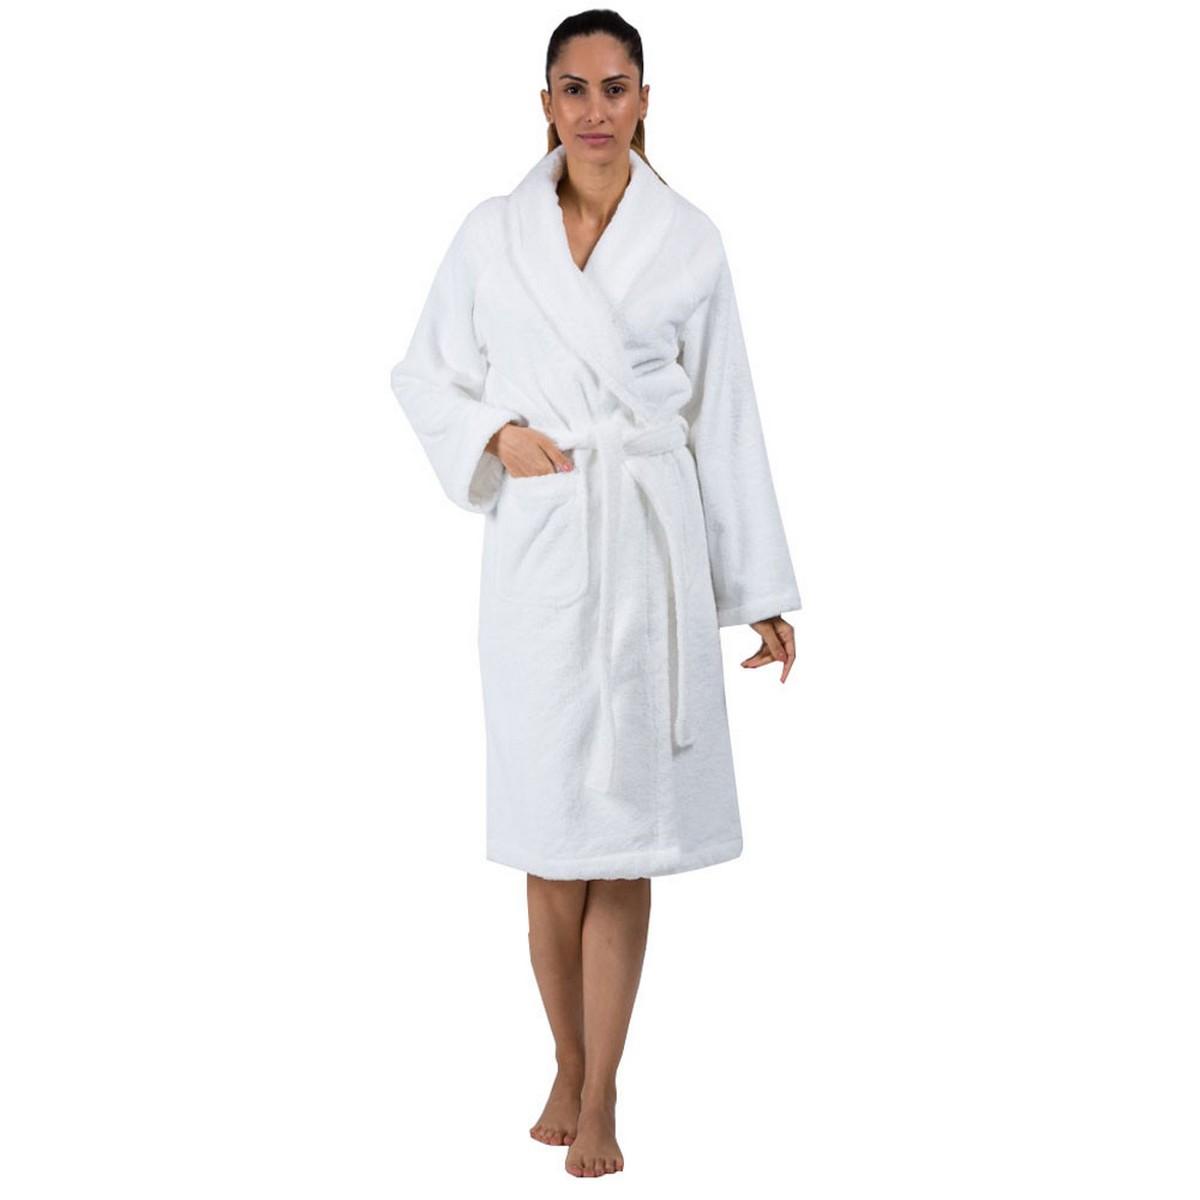 Bathrobe for Men and Women 100% cotton